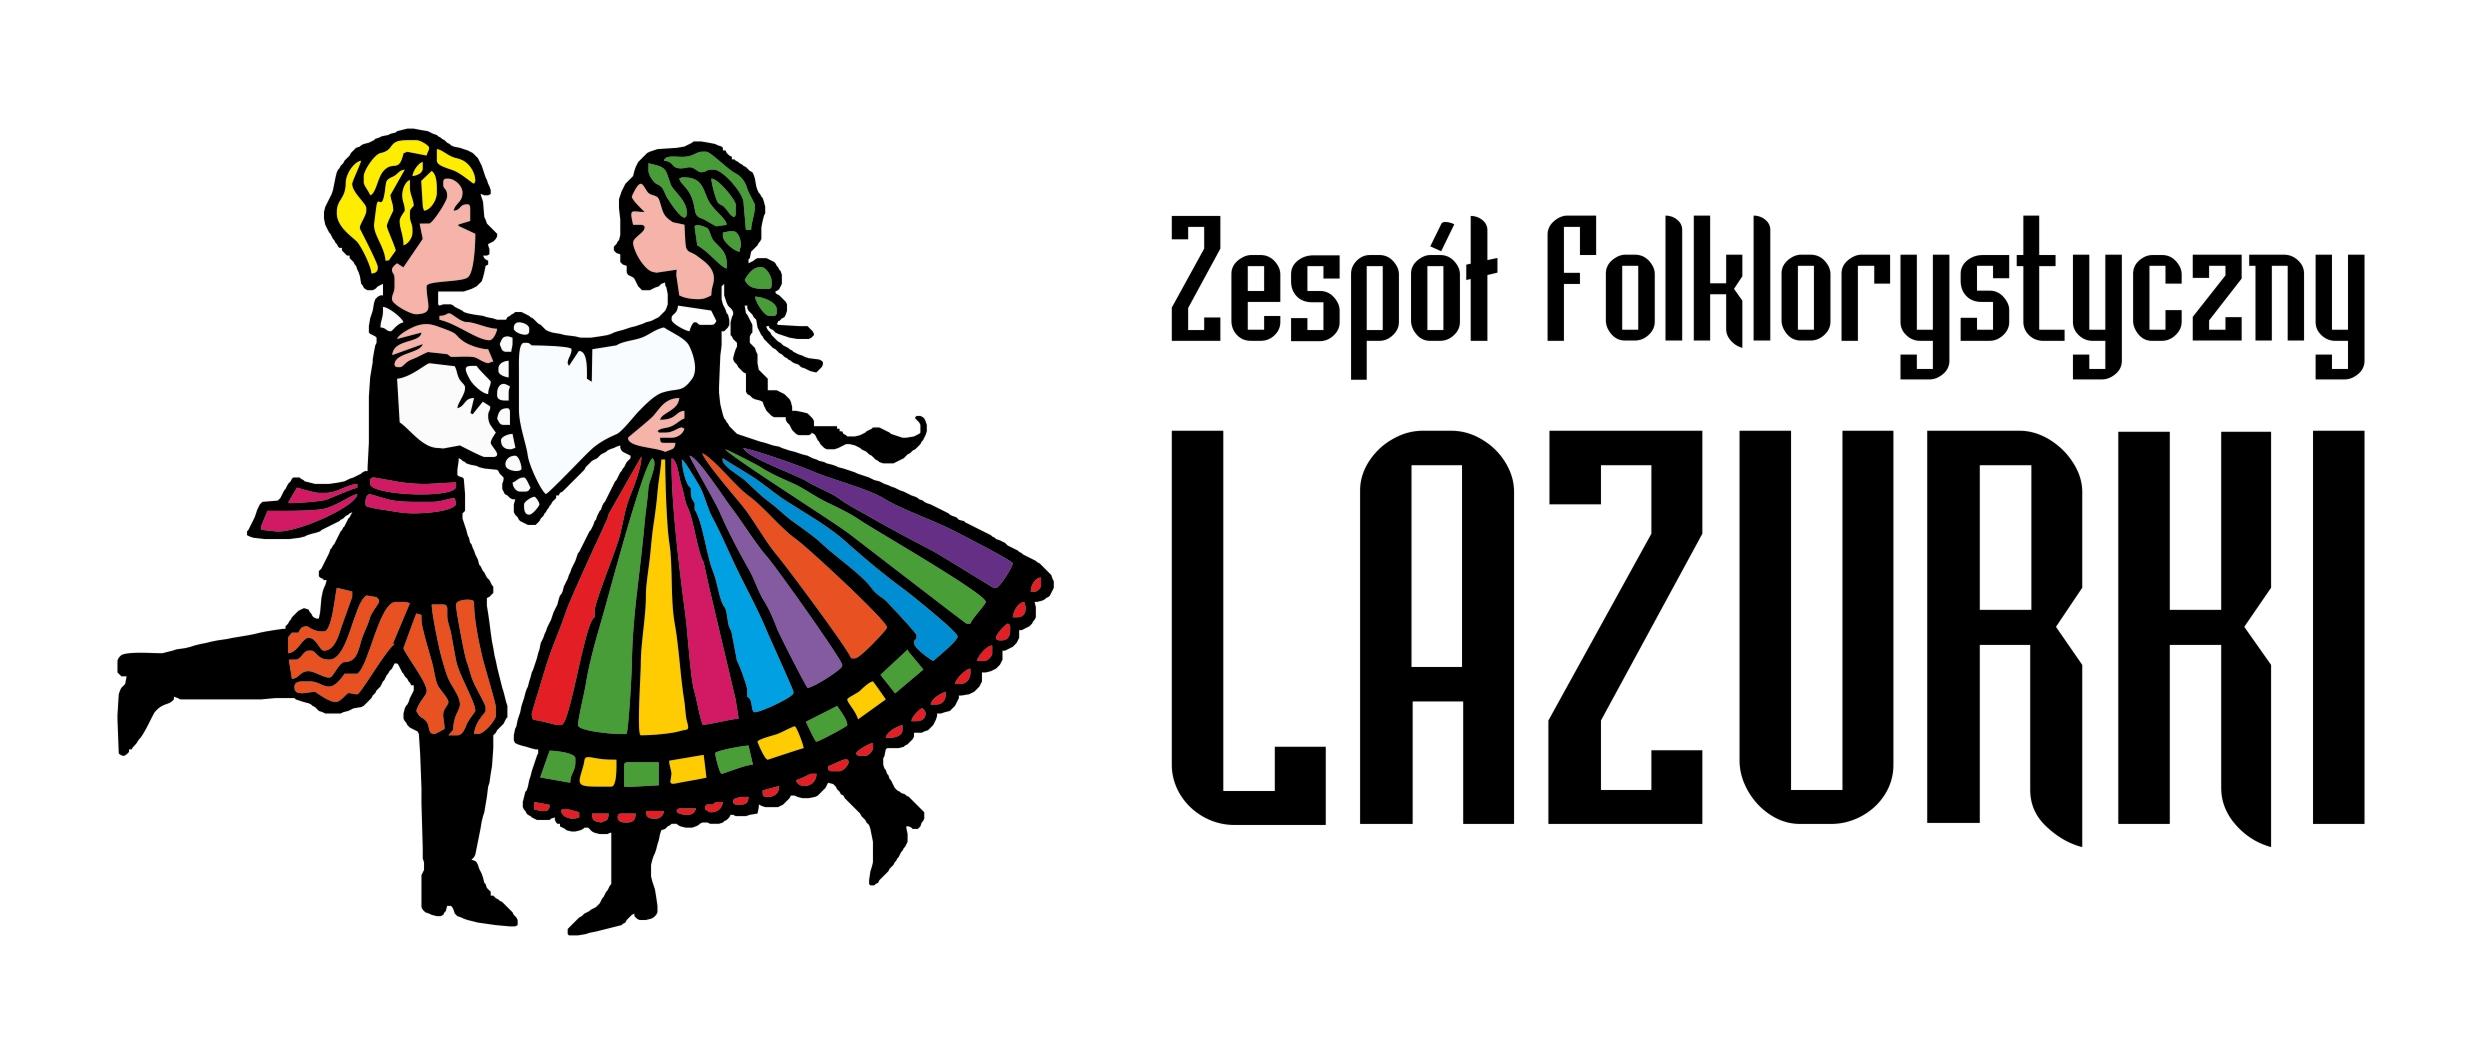 http://lazurki.pl/wp-content/themes/lazurki/grafiki/lazurki-logo-3-kolor.jpg